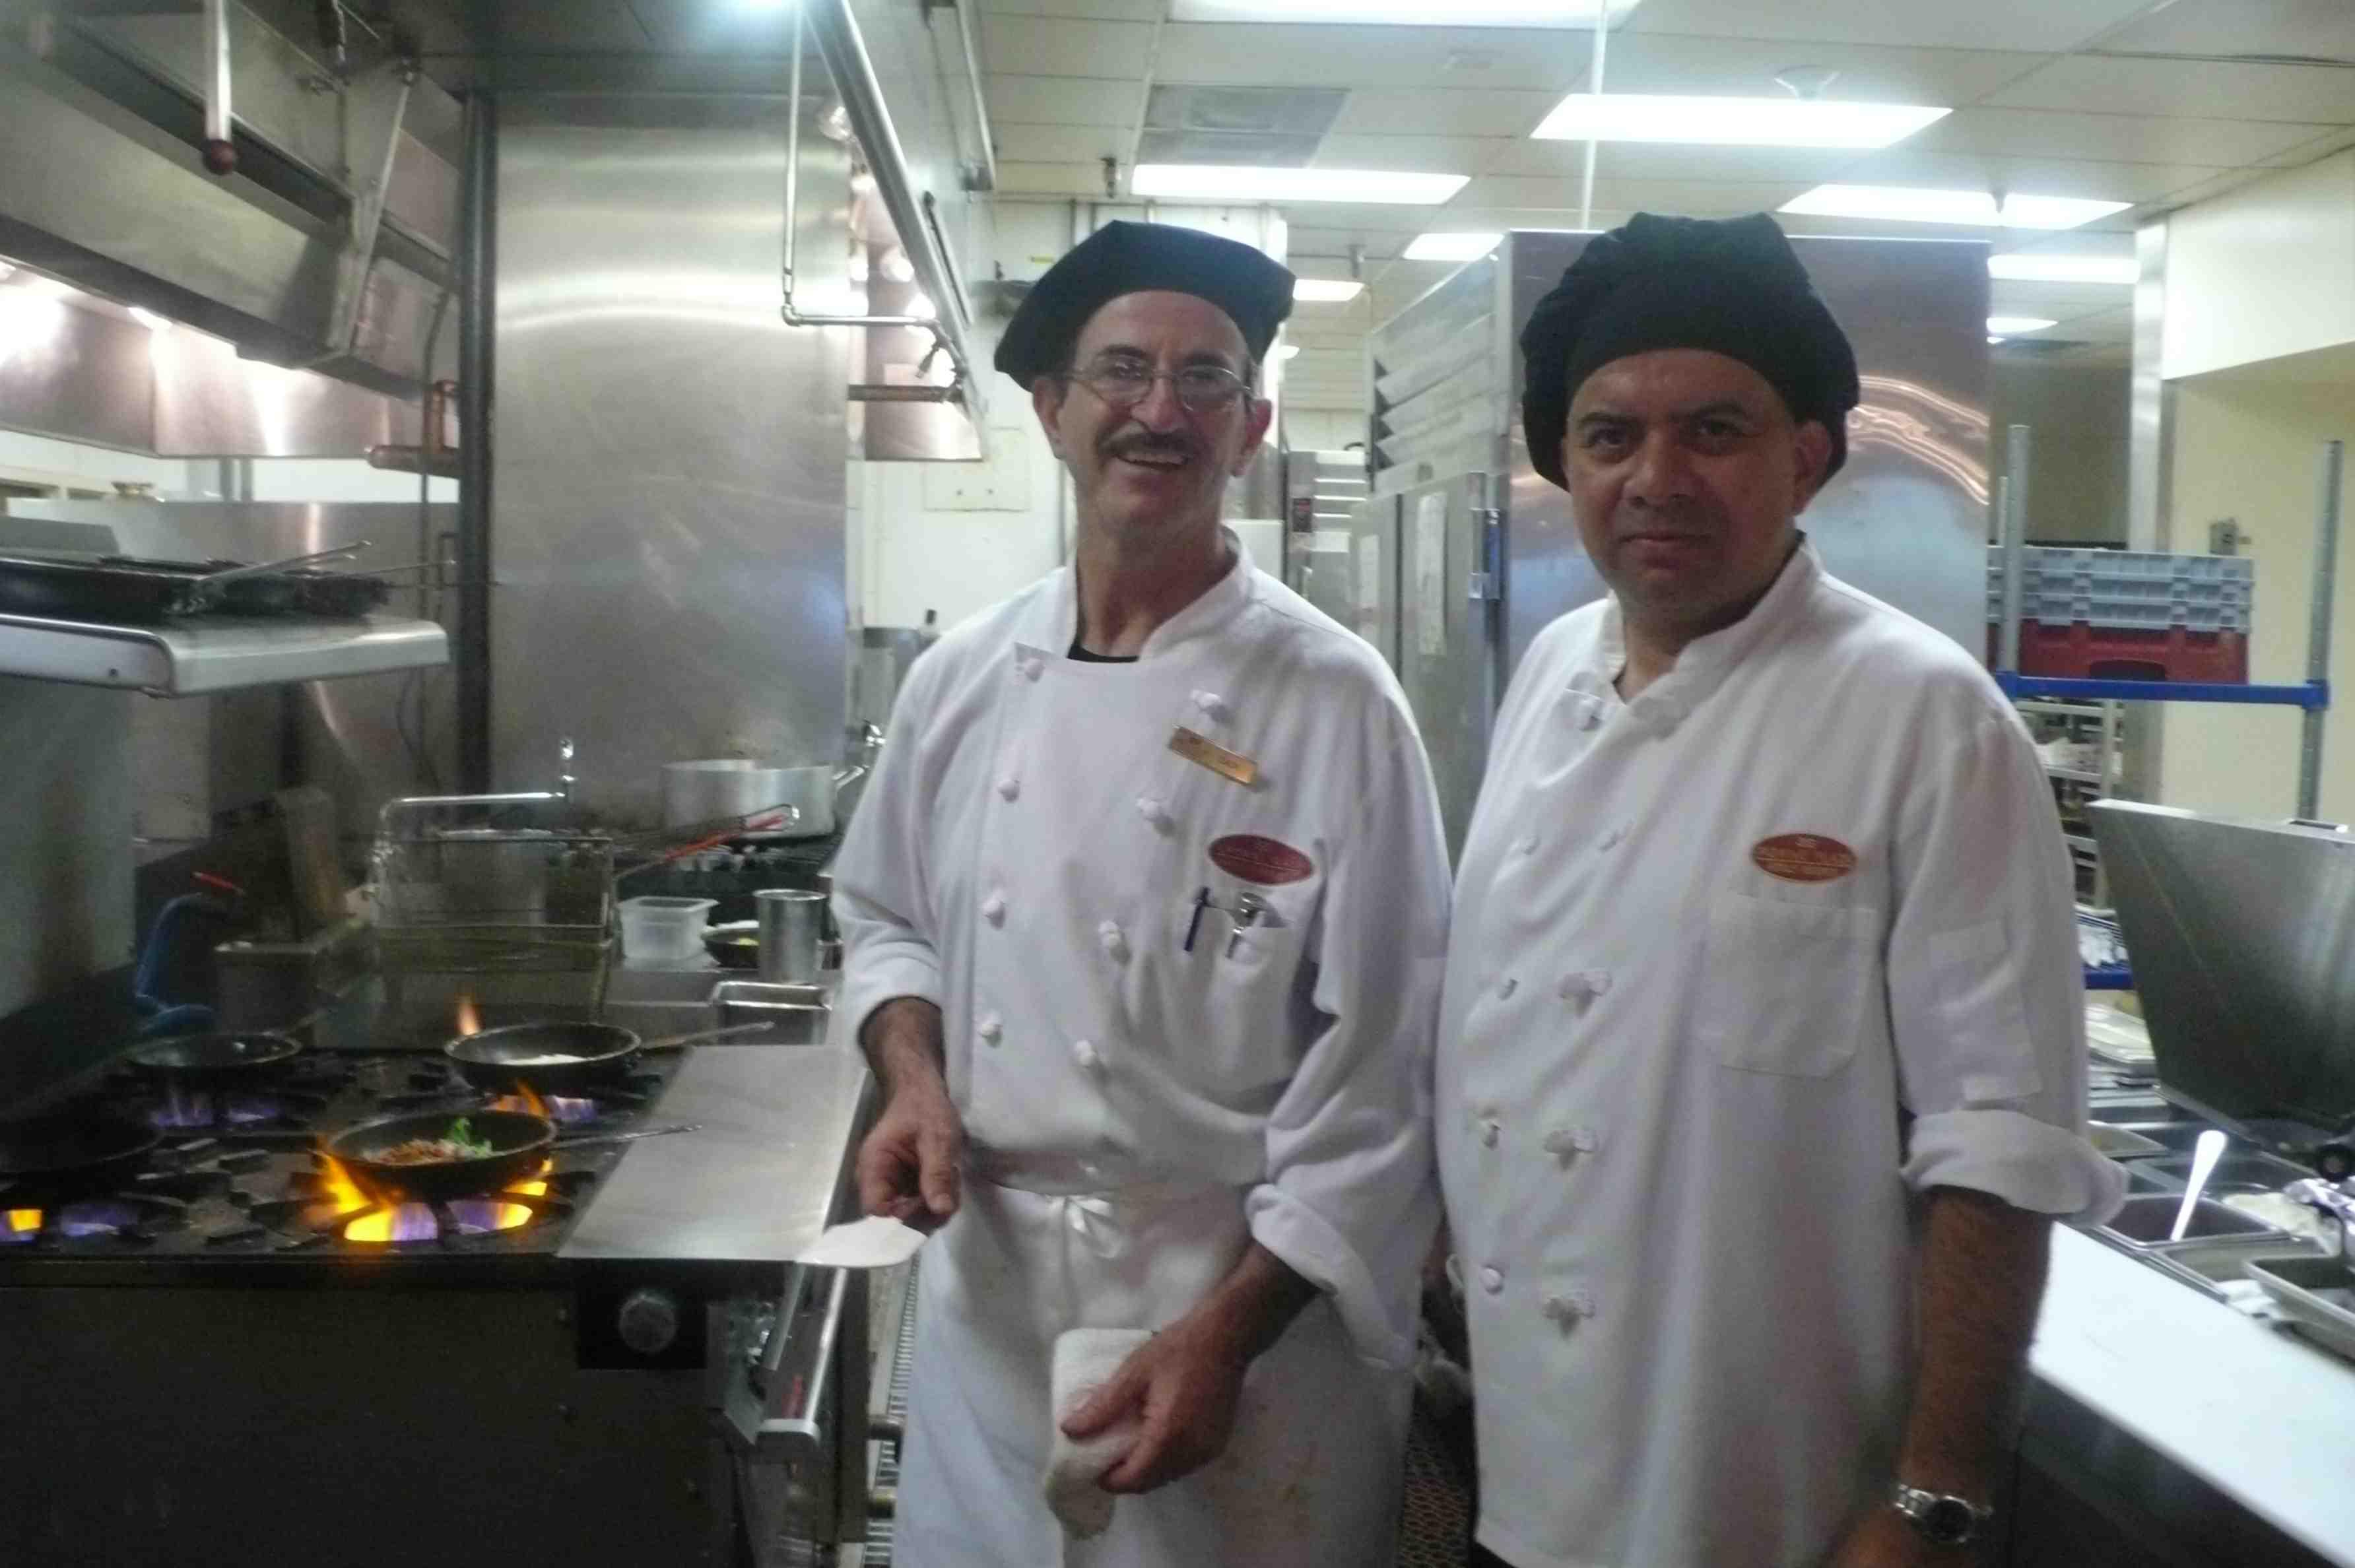 Chefs preparing omelettes